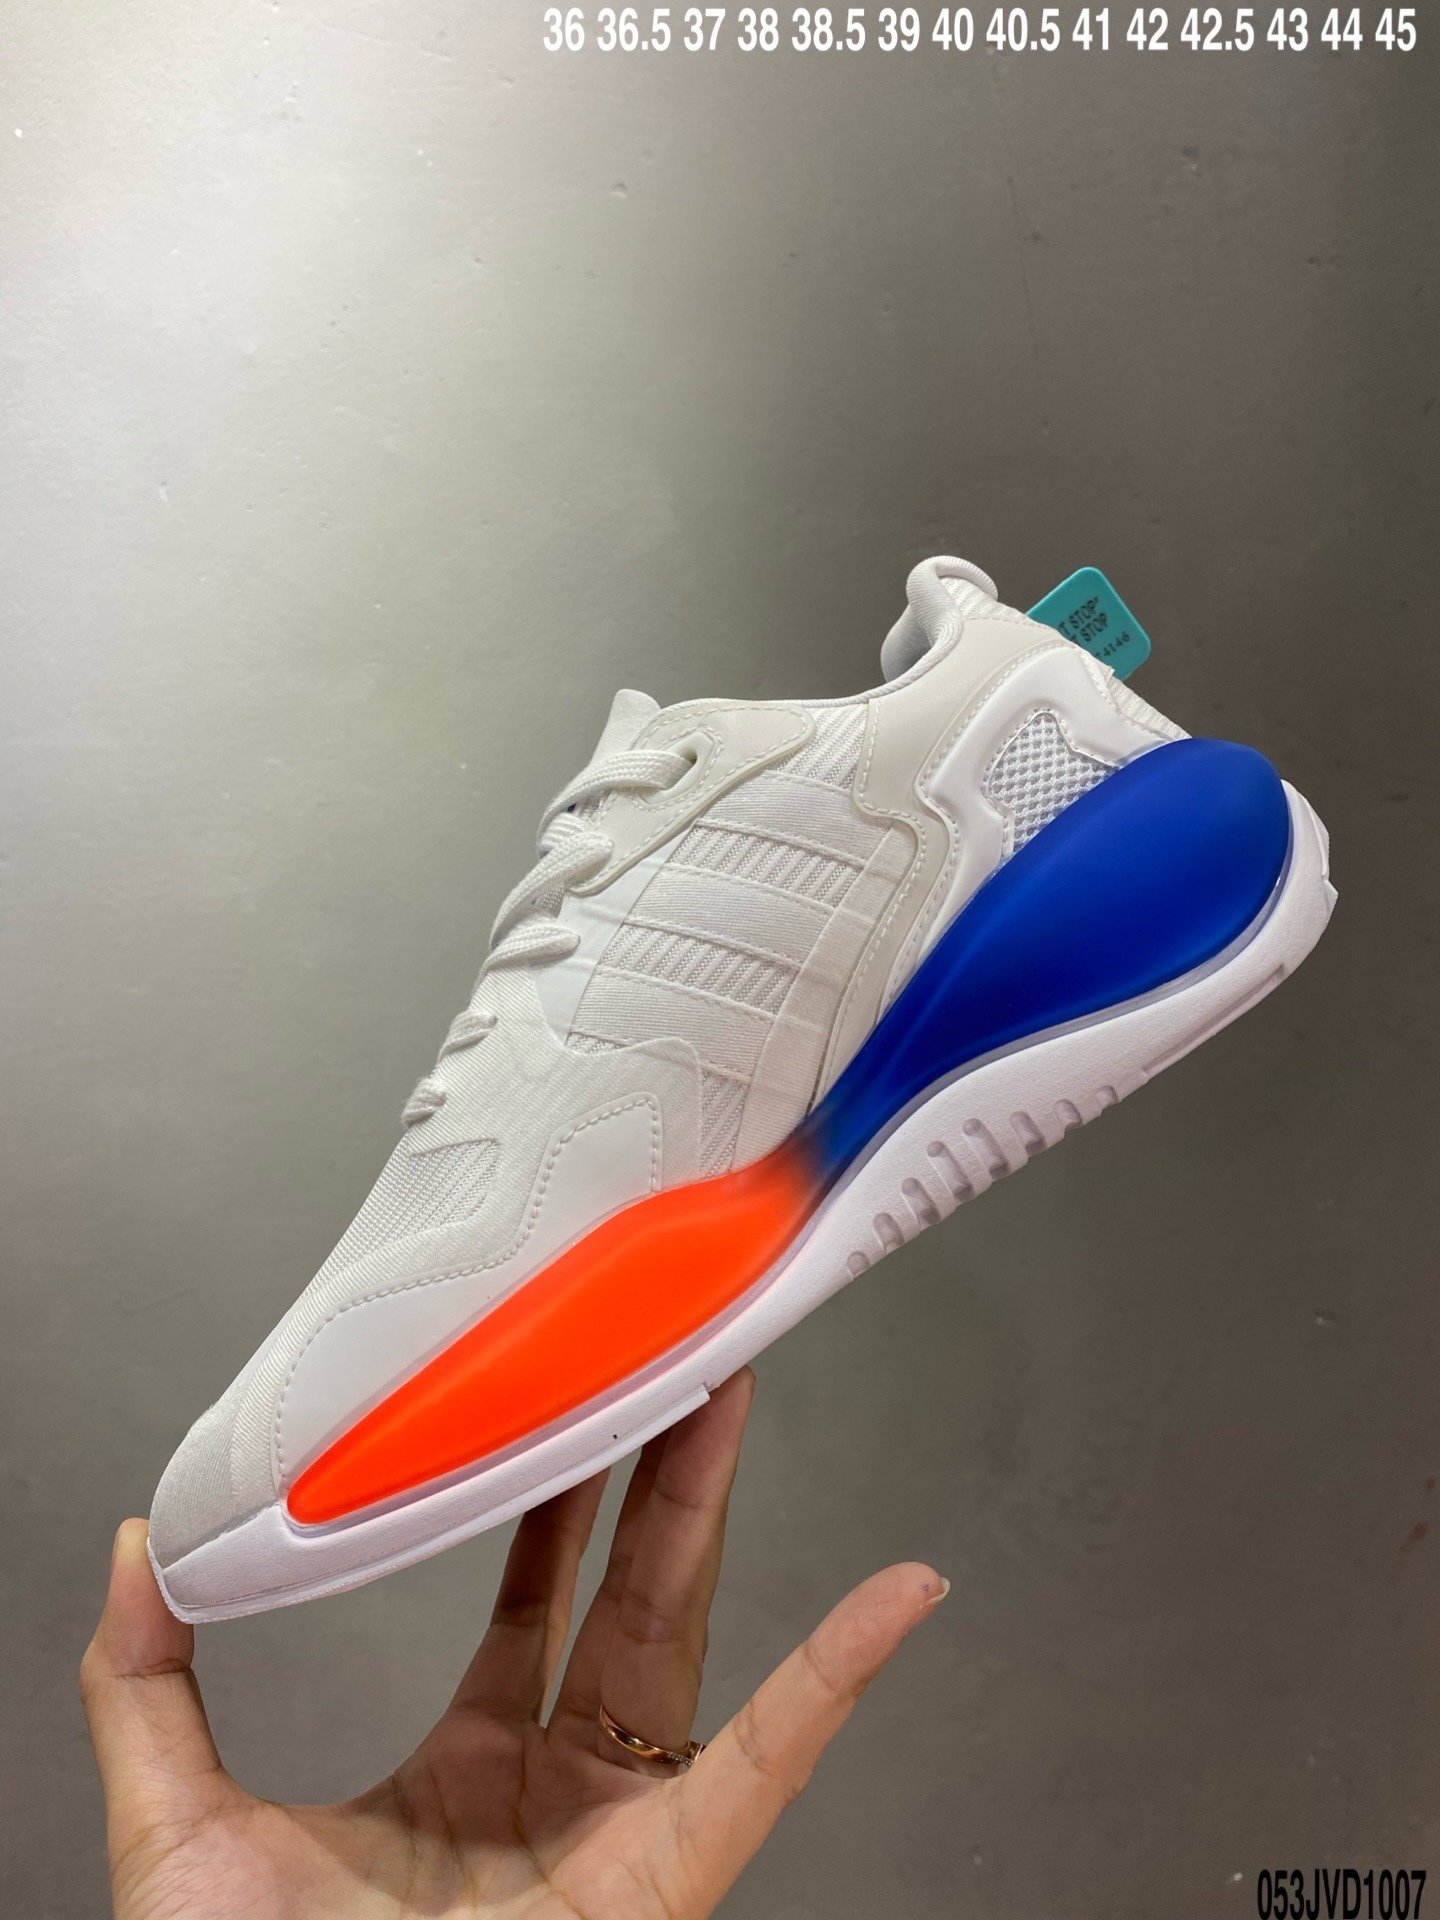 07081136805 - 运动跑鞋, 跑鞋, Originals ZX Alkyne Boost, Boost, Adidas